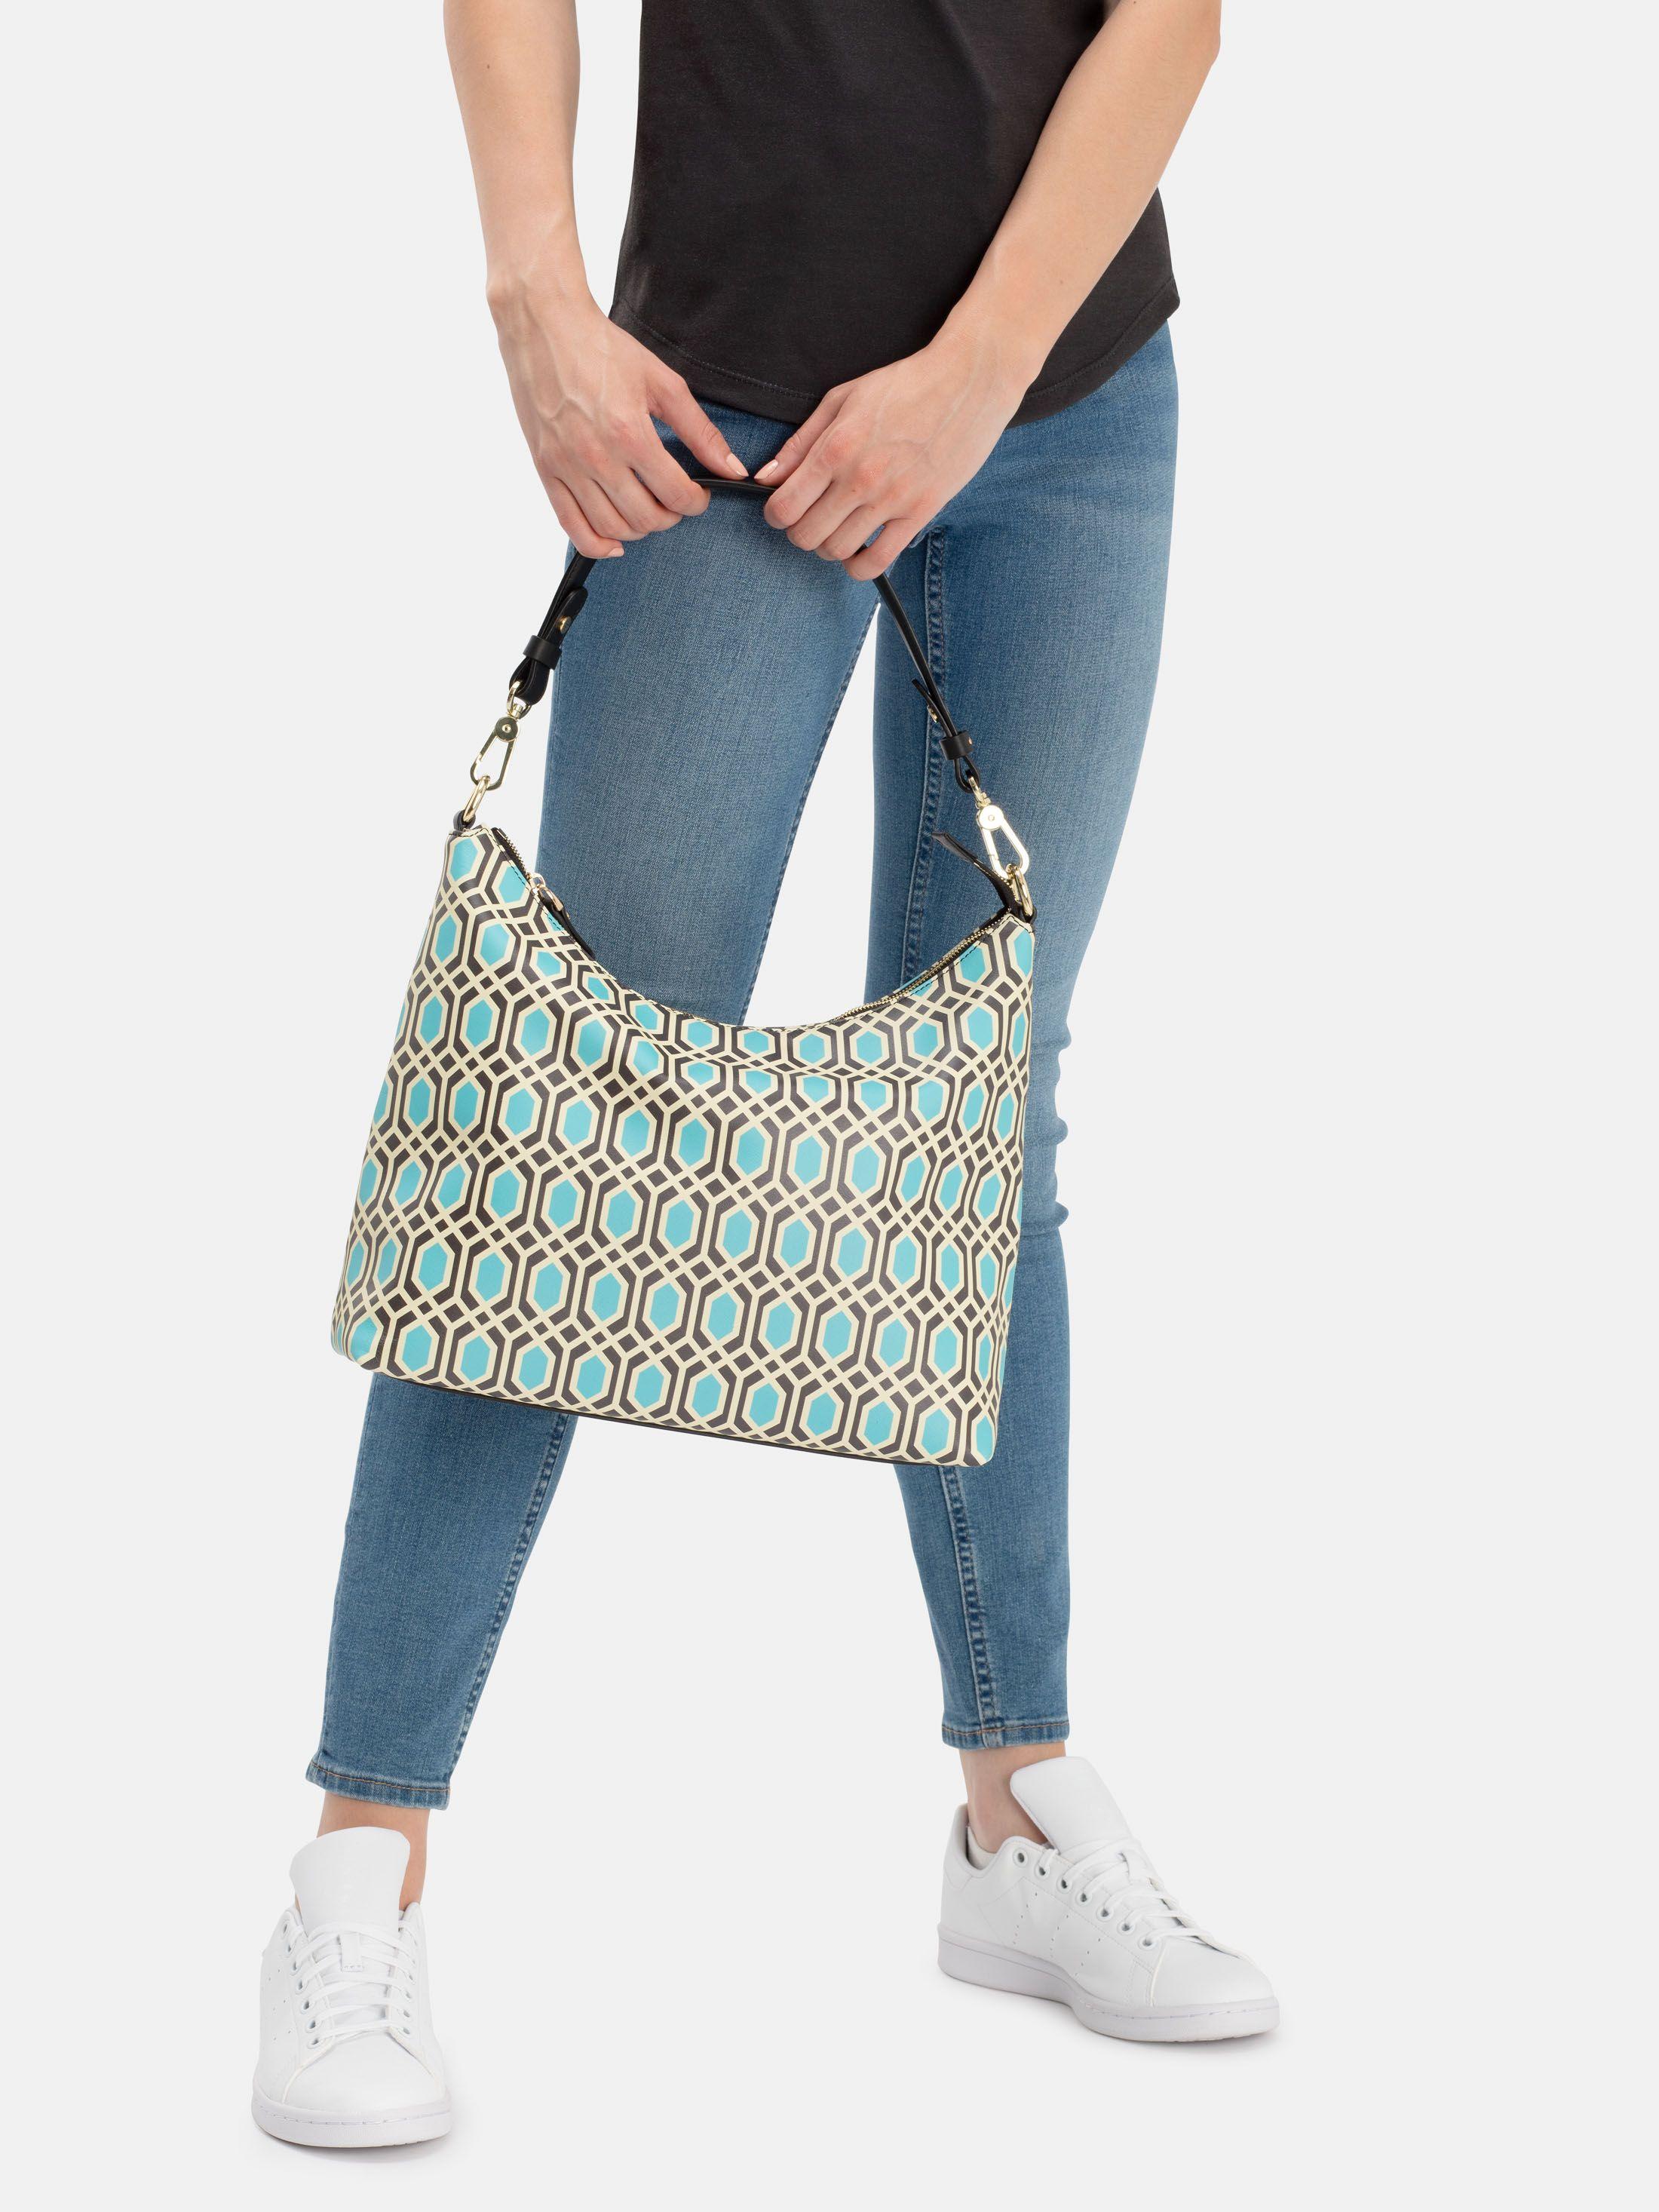 Custom Hobo Bags